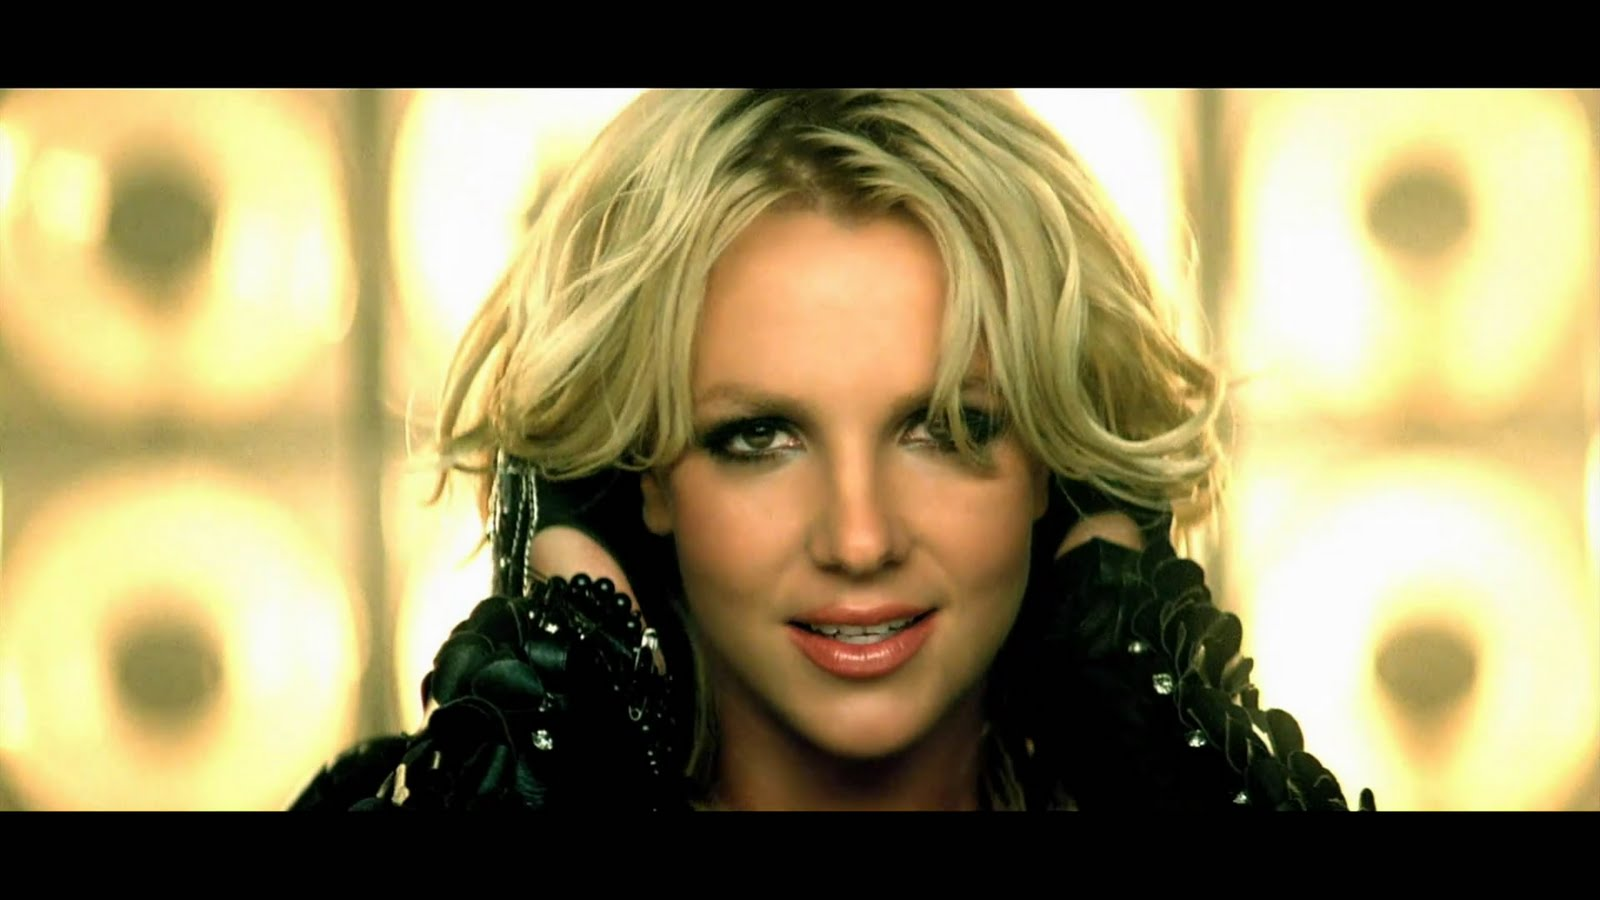 http://1.bp.blogspot.com/-ZzqgwHFPLc8/TnbFlWf7EGI/AAAAAAAADuo/nfOFfb17mHY/s1600/Britney-Spears-Till-The-World-Ends-Mero_mp4_snapshot_01_35_2011_04_07_14_00_14.jpg